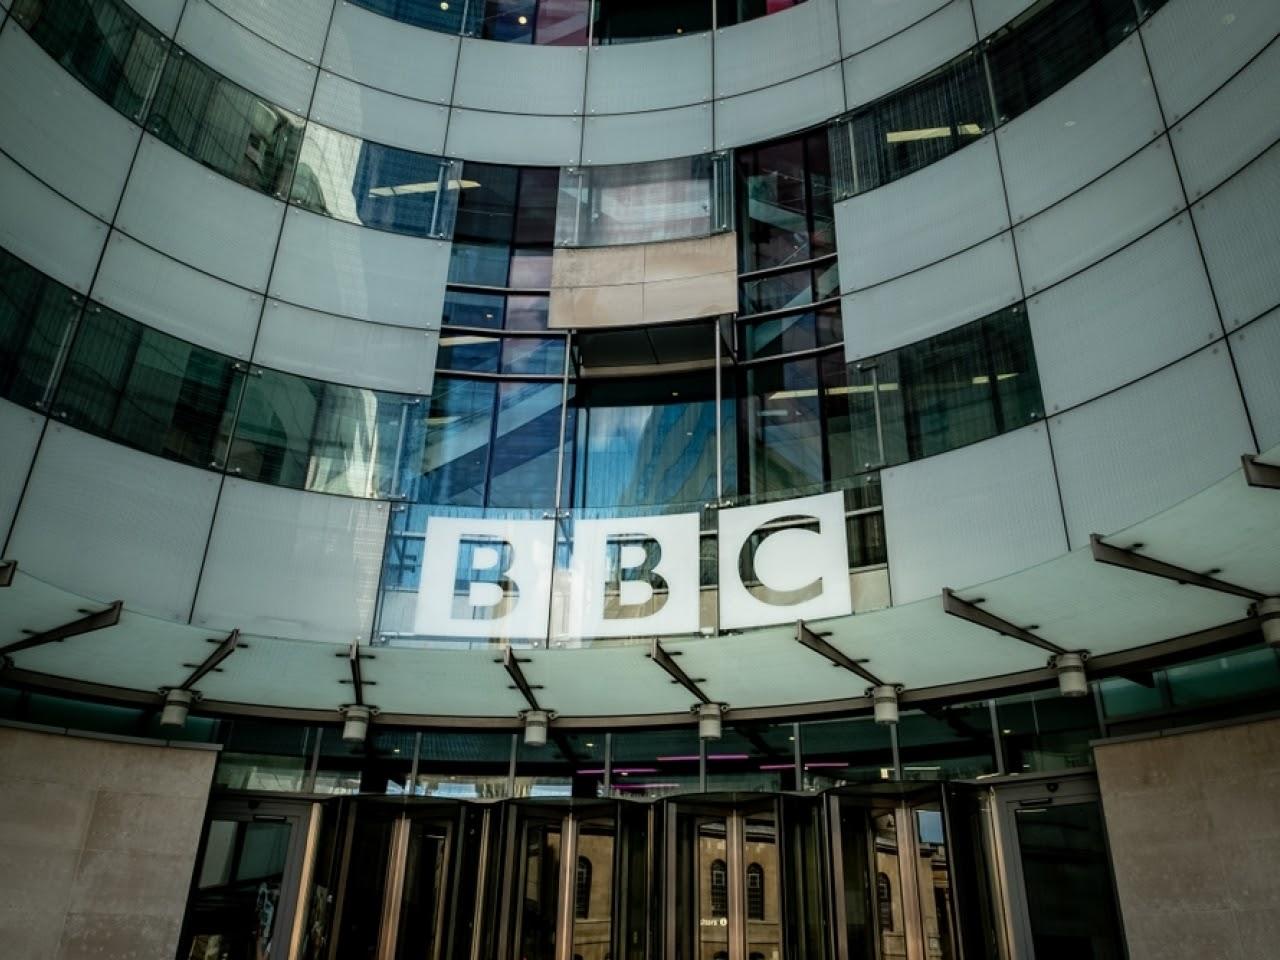 Beijing's media regulator say it's banning BBC World News. File image: Shutterstock